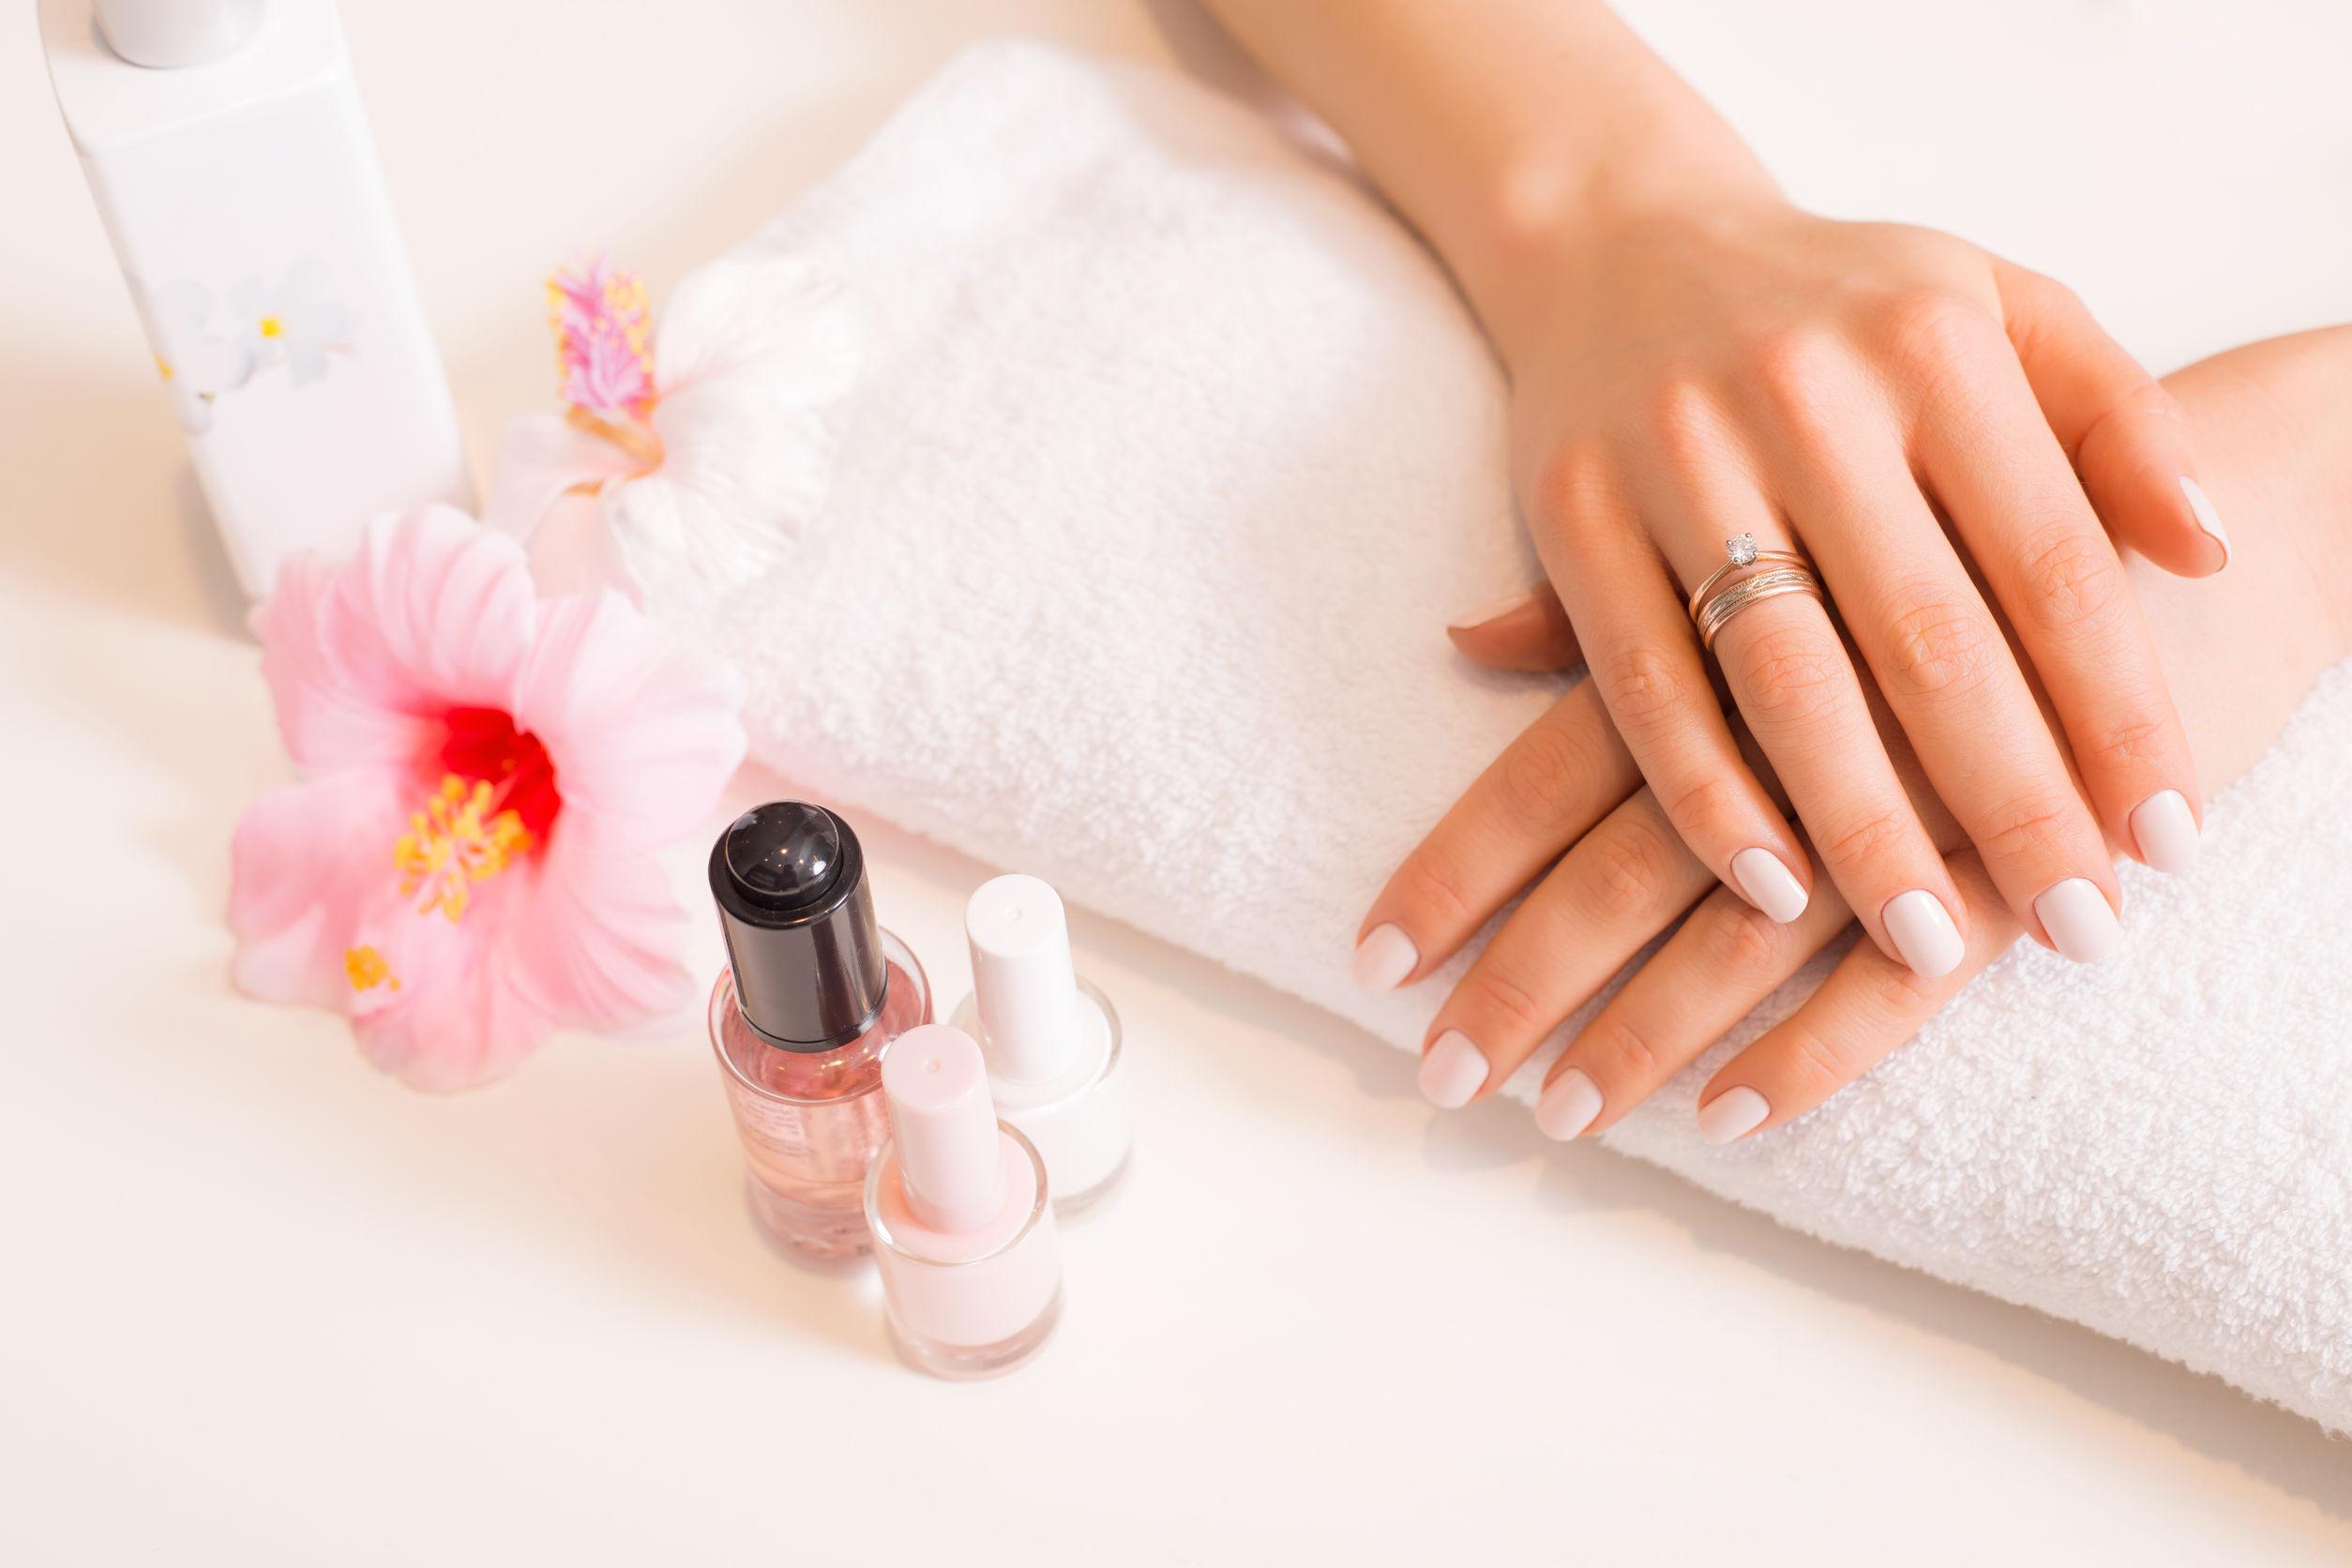 Jak zrobić manicure?